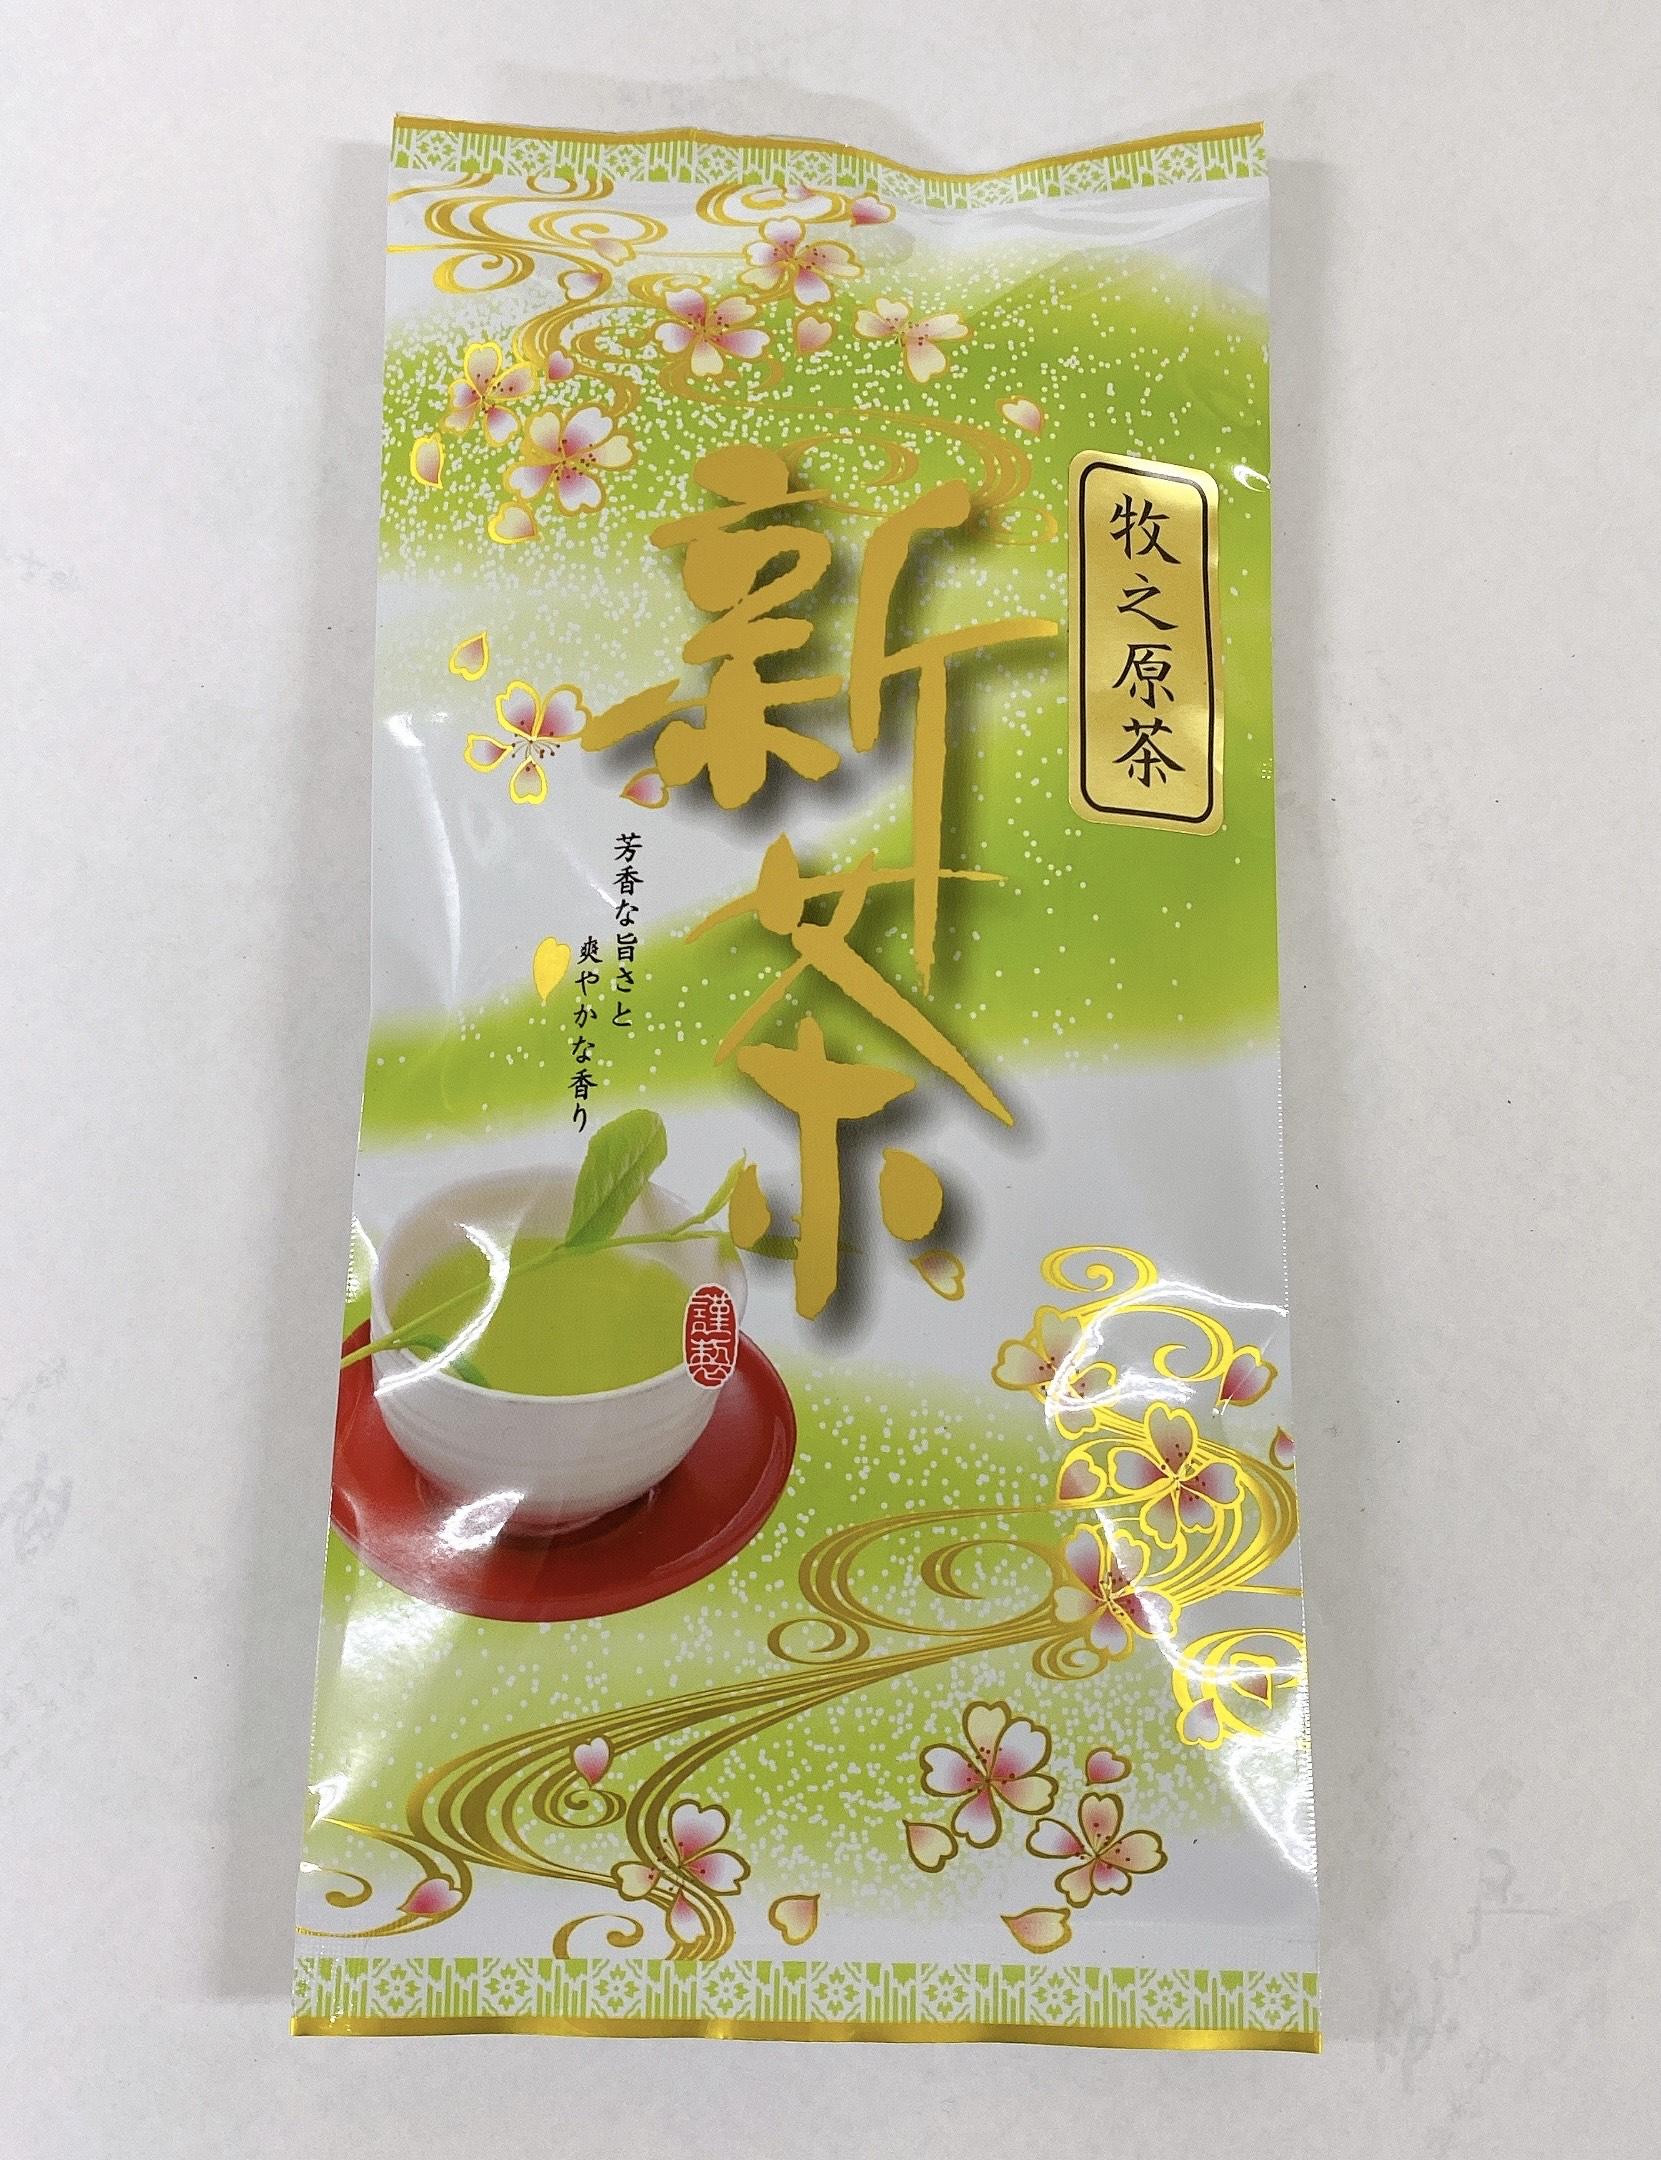 静岡茶(牧之原茶)04高級煎茶700円 100グラム